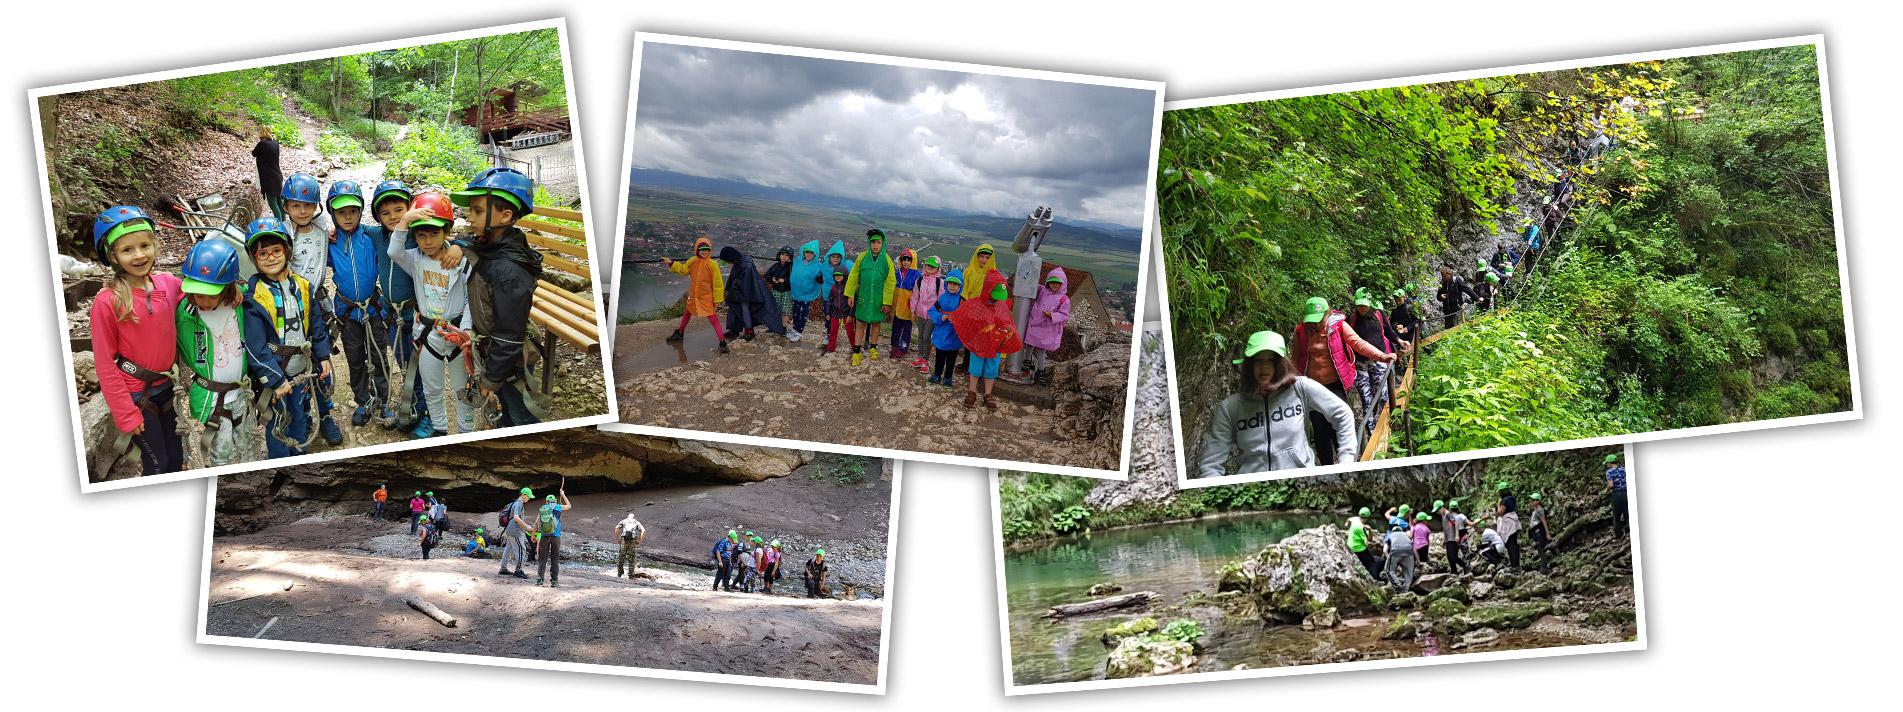 Activitati sportive de vara pentru copii | Sport Ski Club | Brasov